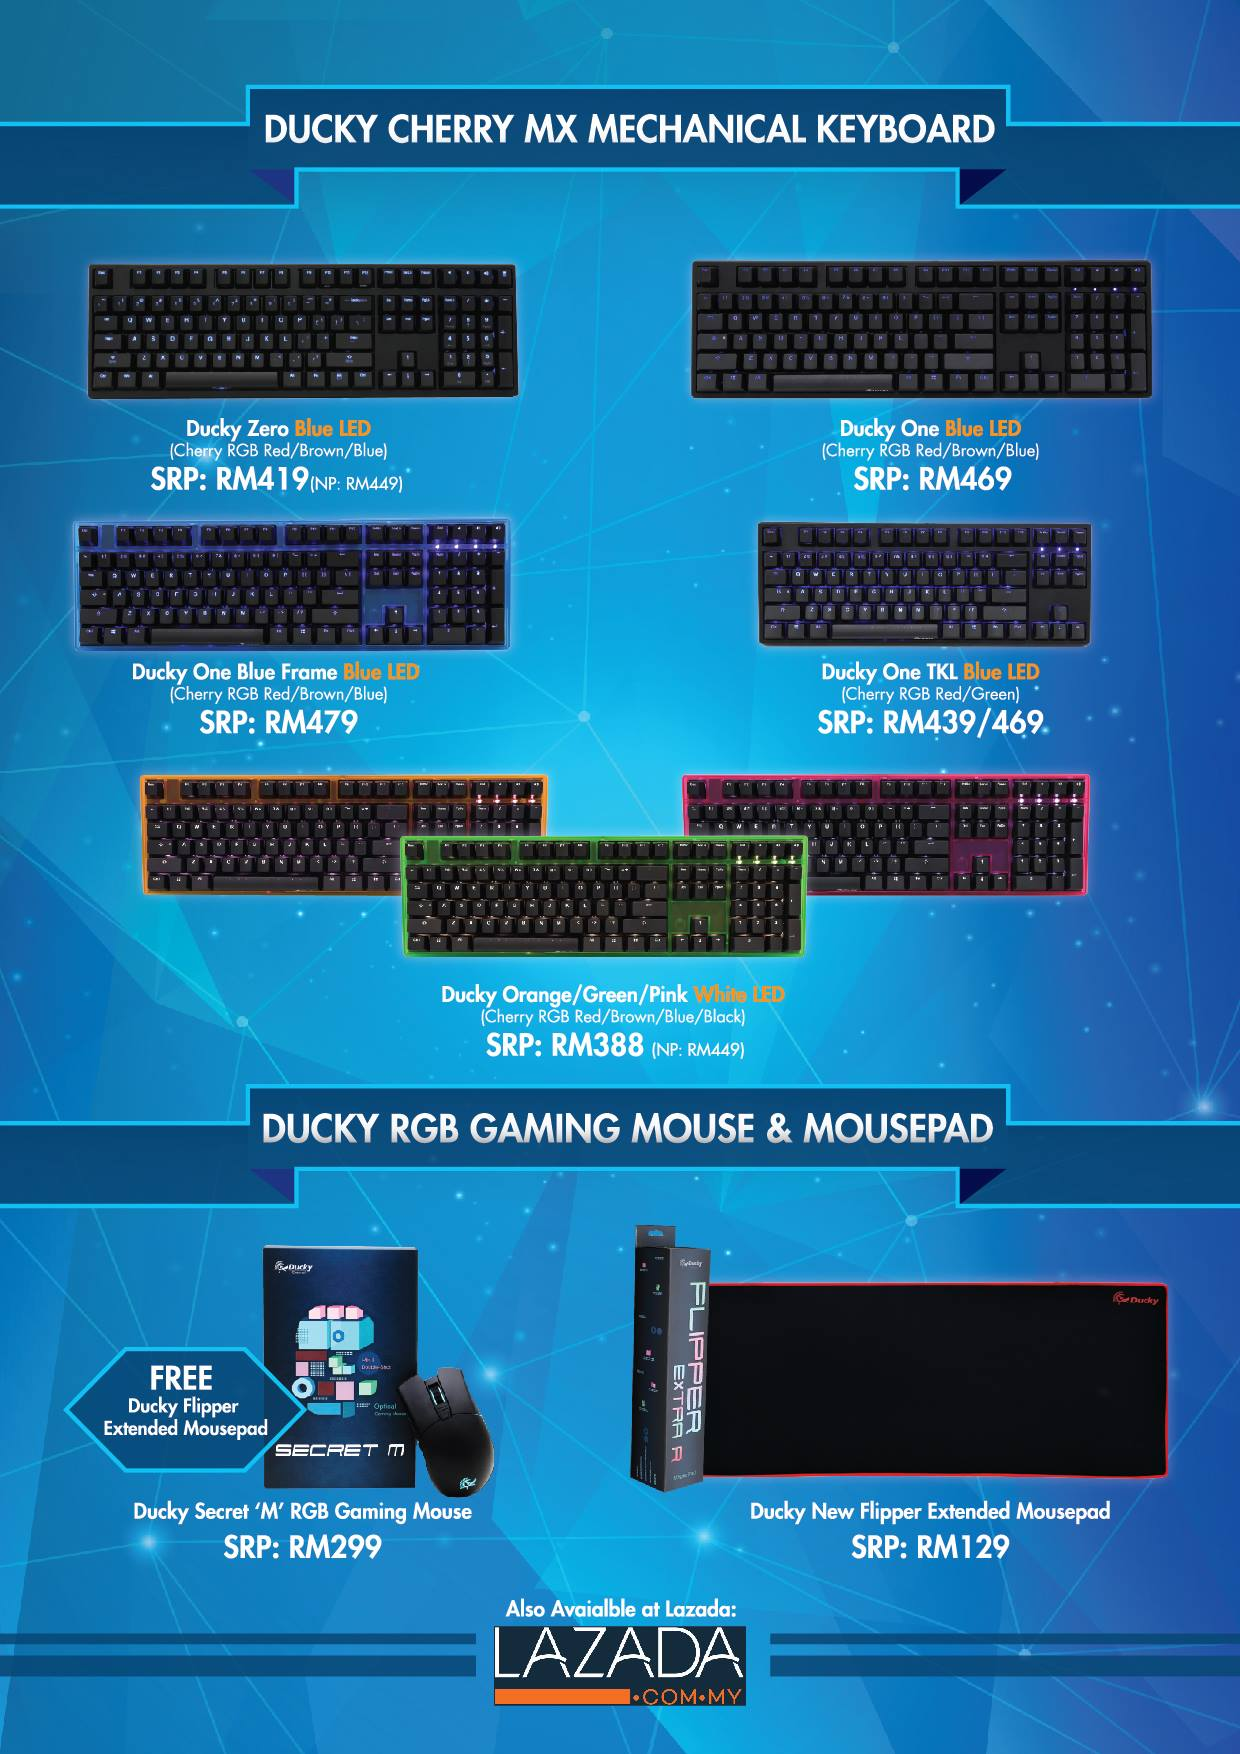 Wts Cherry Ducky Deck Filco Mechanical K B One Tkl White Rgb Mx Brown Imghttps C7staticflickrcom 6 5607 31118785870 4866032b4e O